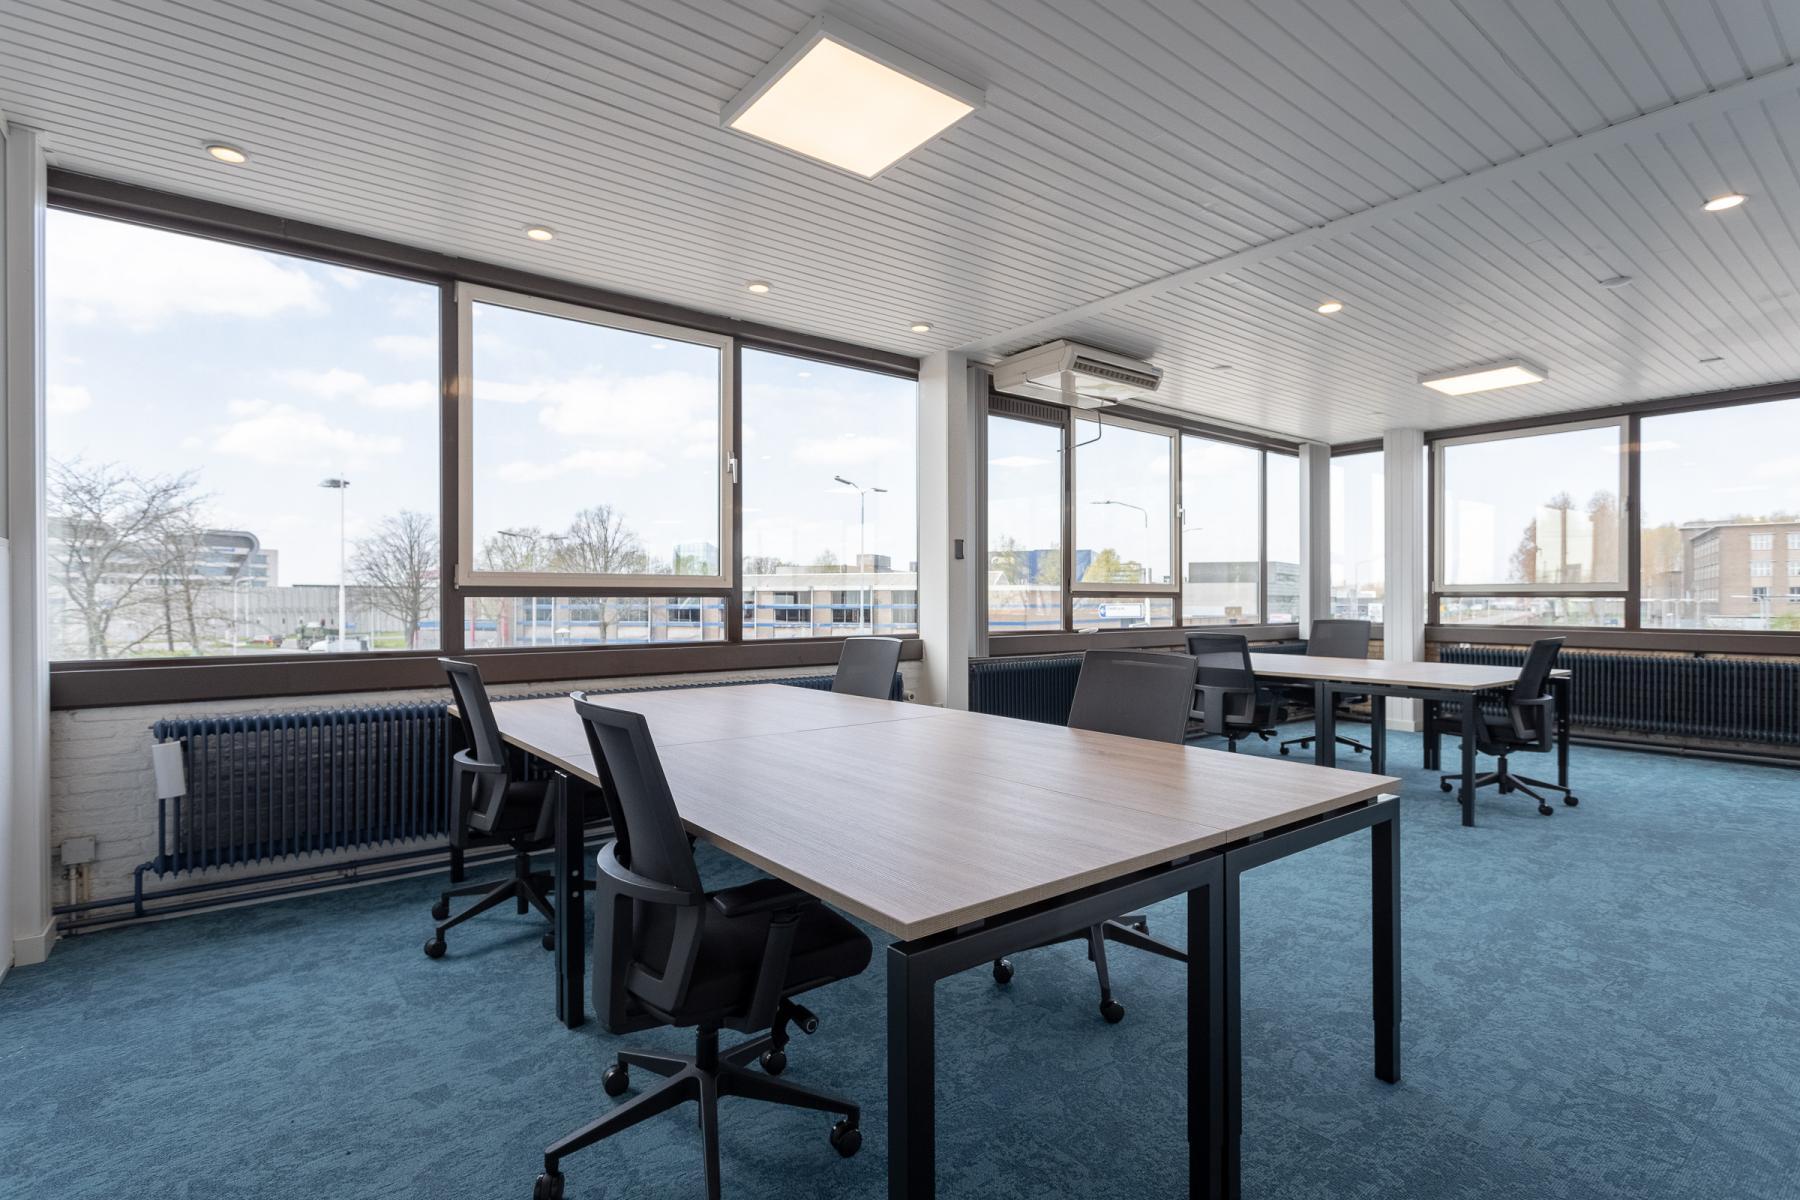 kantoorruimte ingericht meubels kant en klaar Utrecht Atoomweg